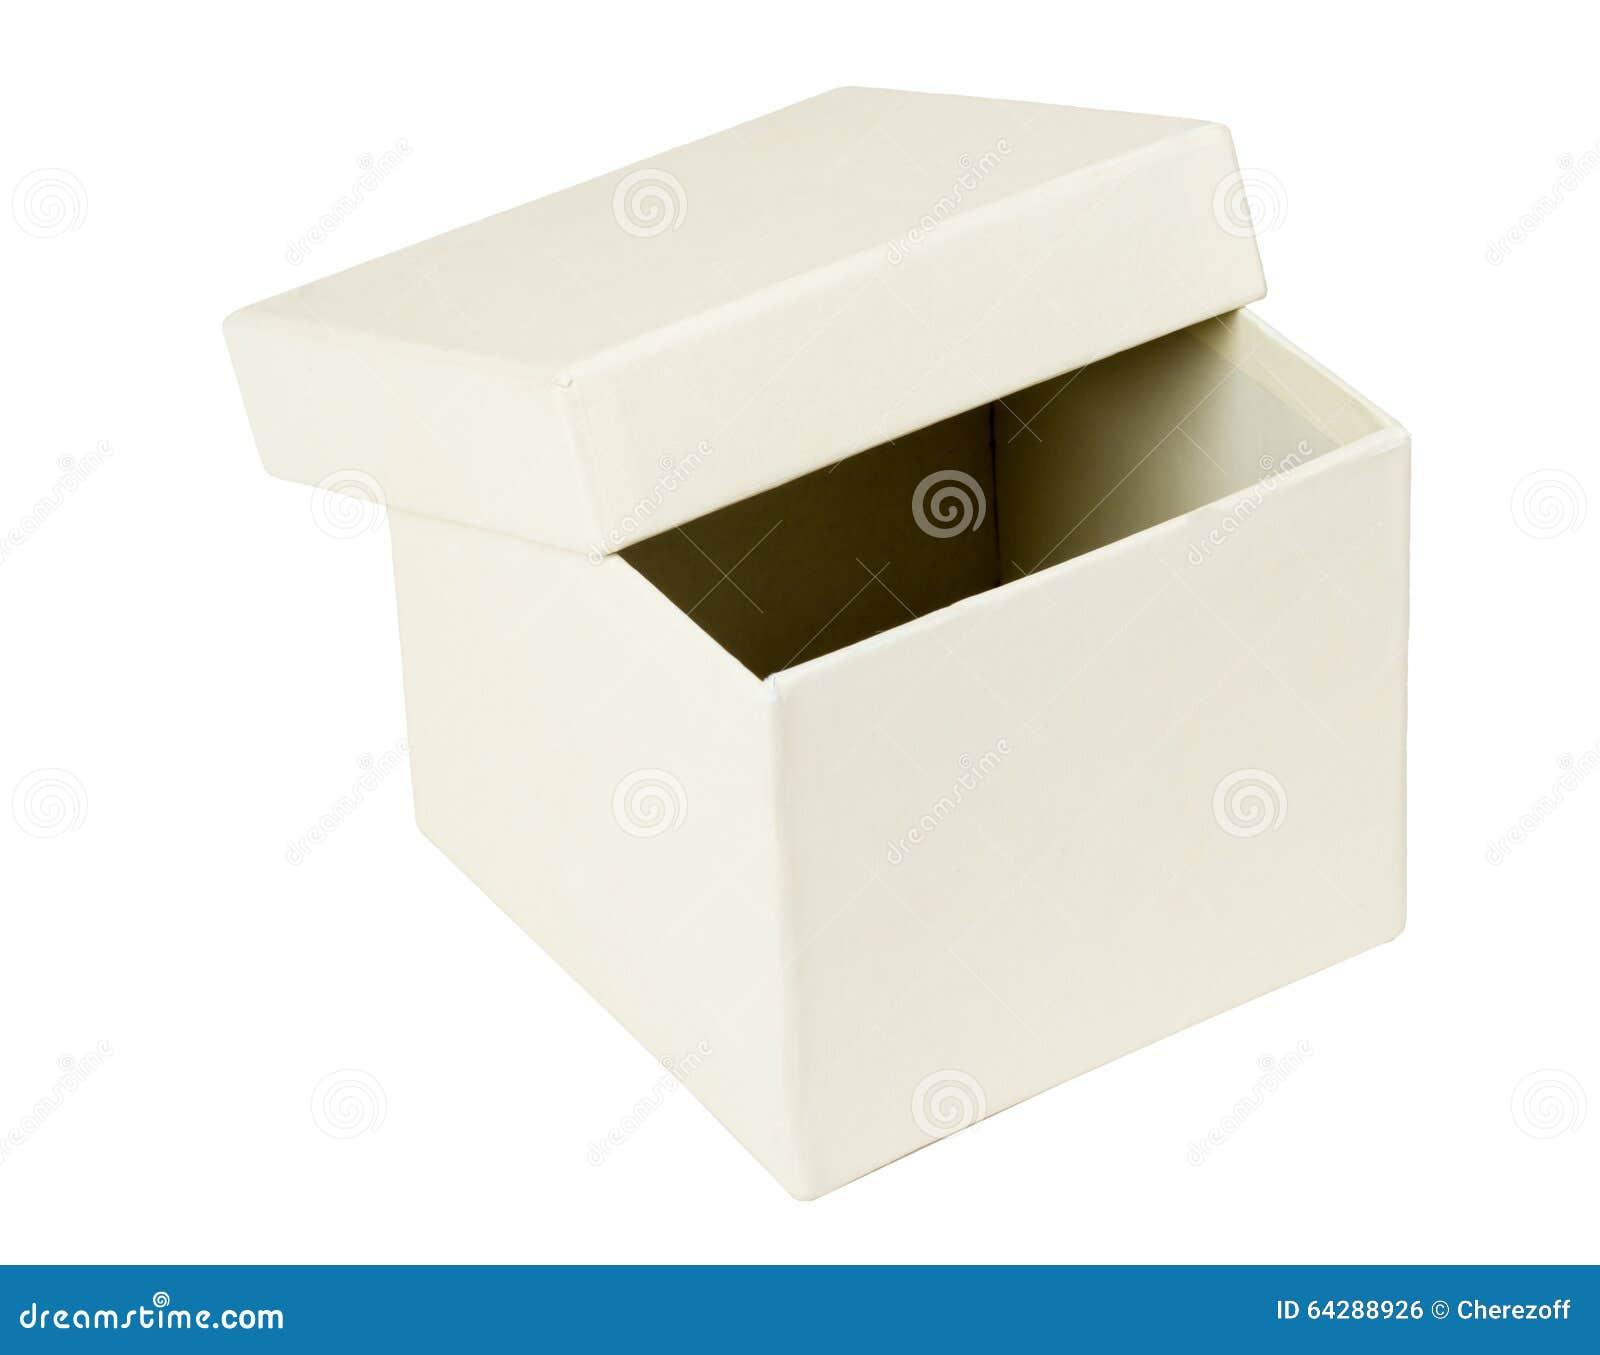 Open white box stock photo. Image of empty, cardboard ...